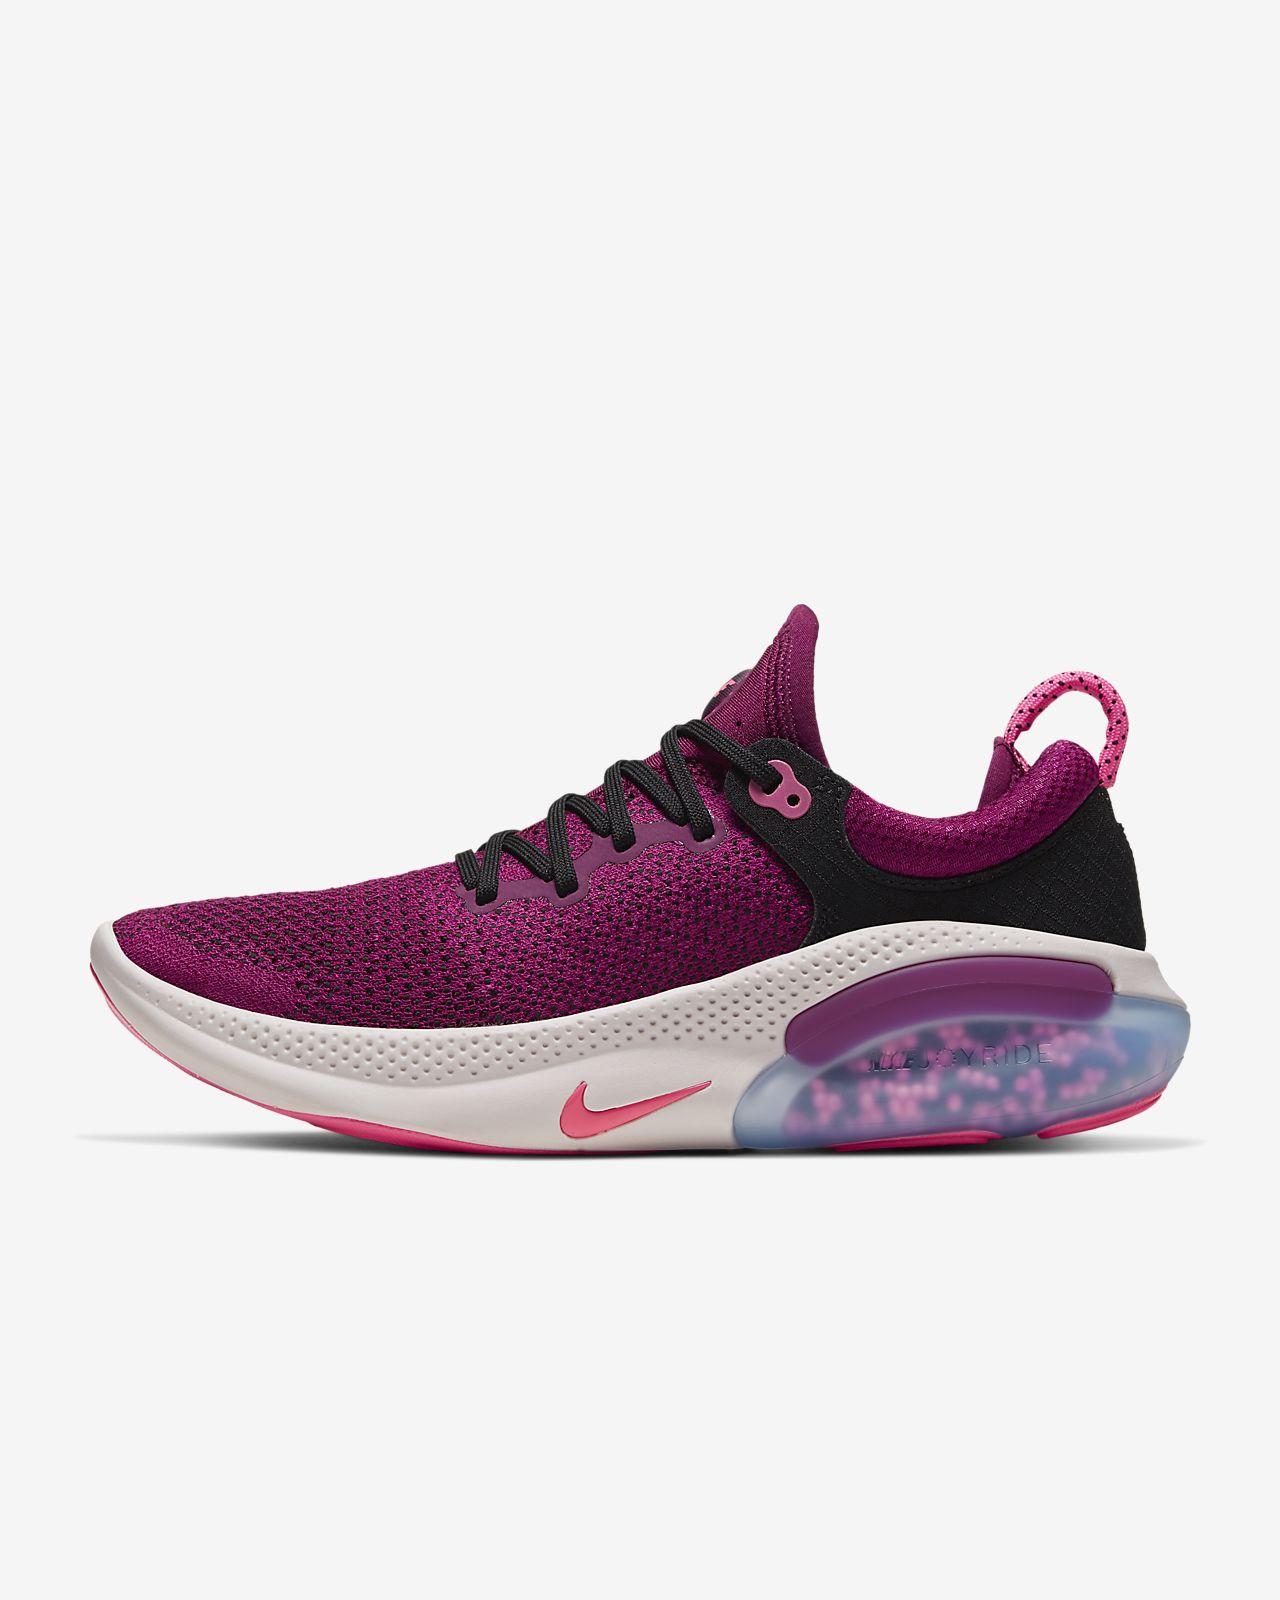 Calzado de running para mujer Nike Joyride Run Flyknit